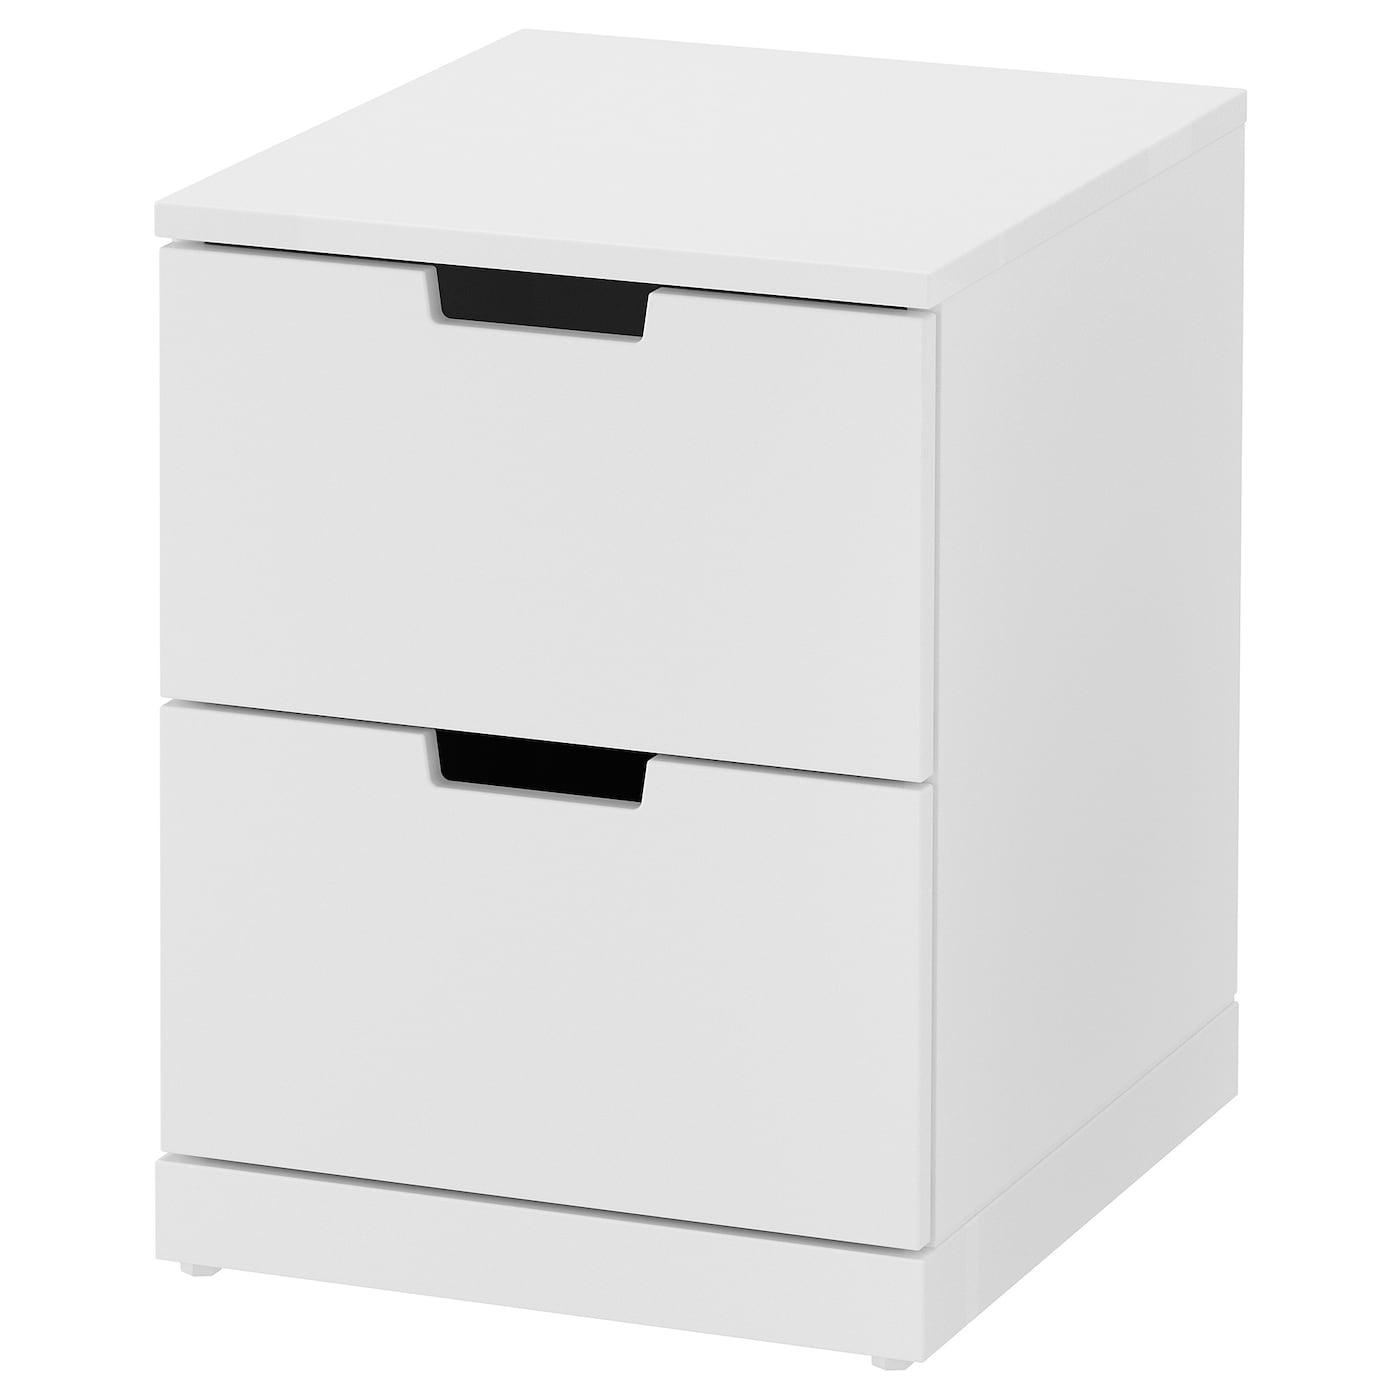 nordli commode 2 tiroirs blanc 40 x 54 cm ikea. Black Bedroom Furniture Sets. Home Design Ideas